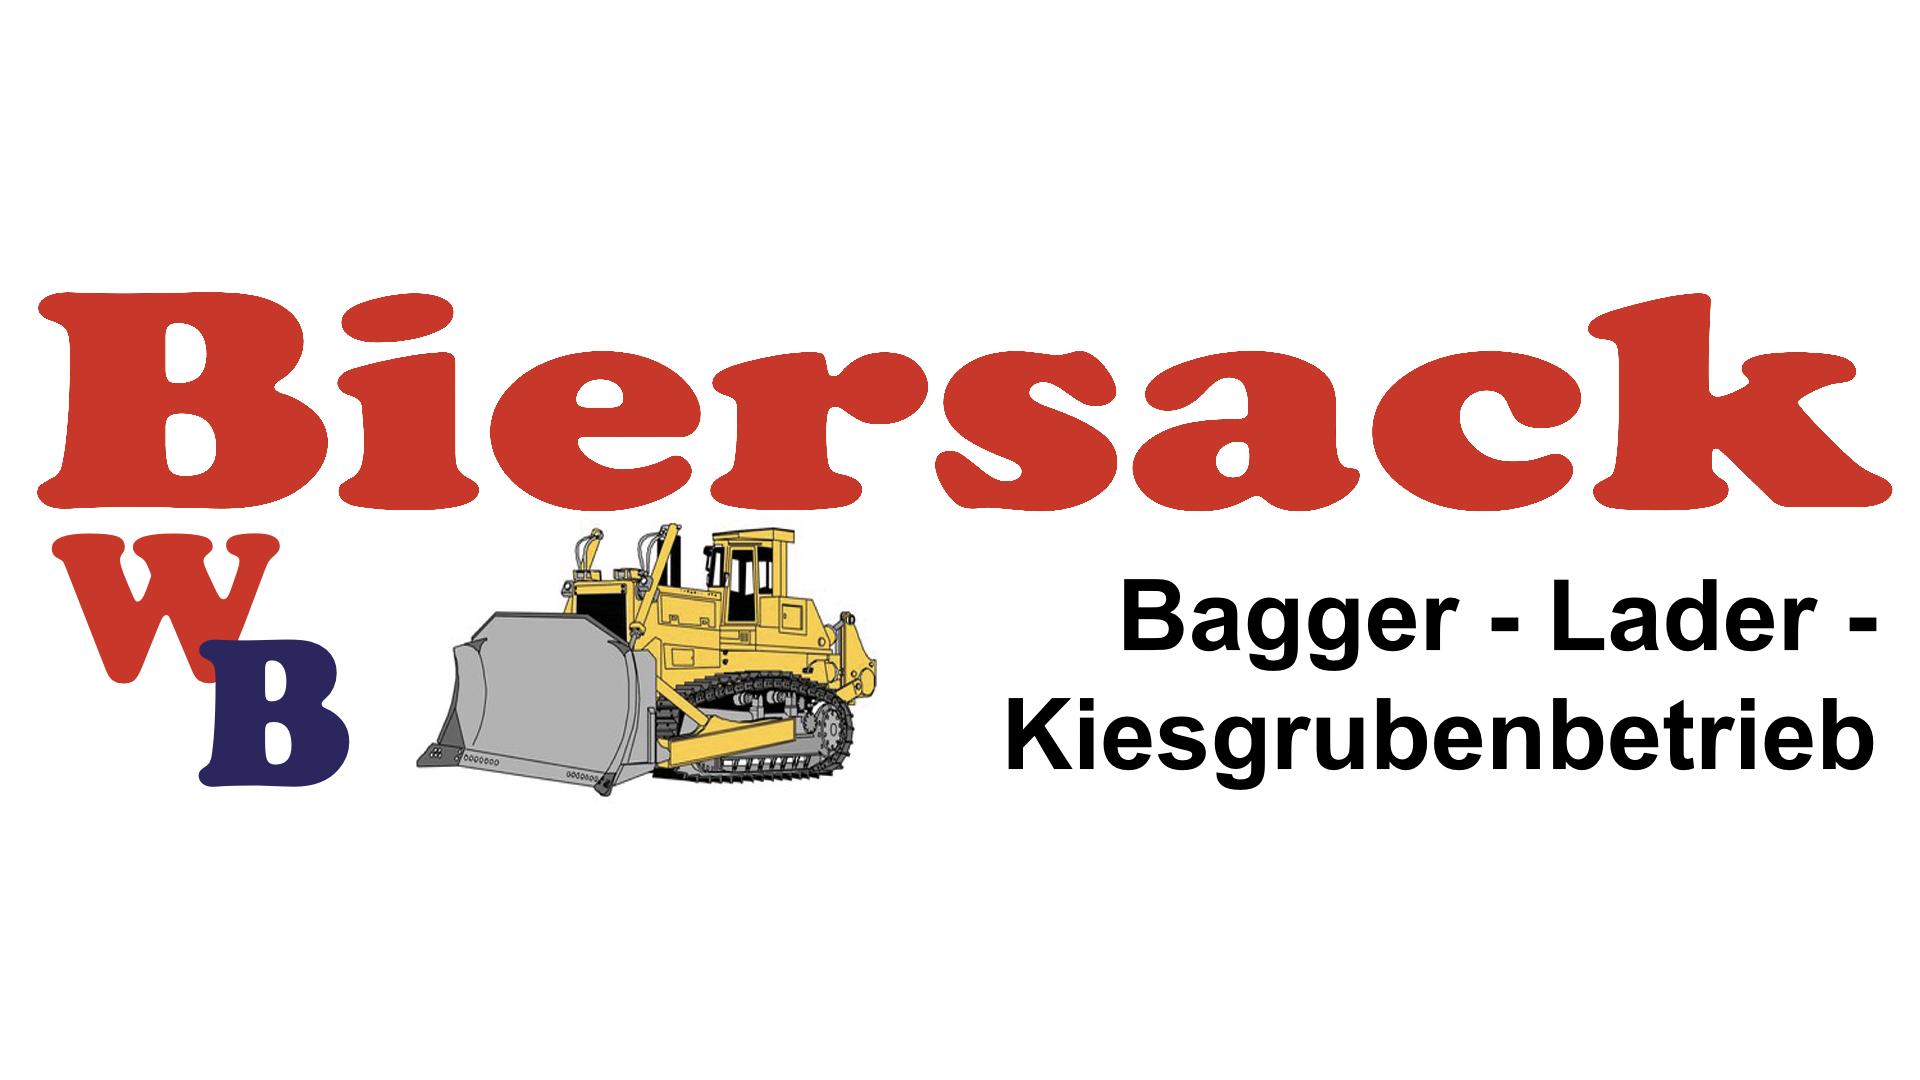 Werner Biersack